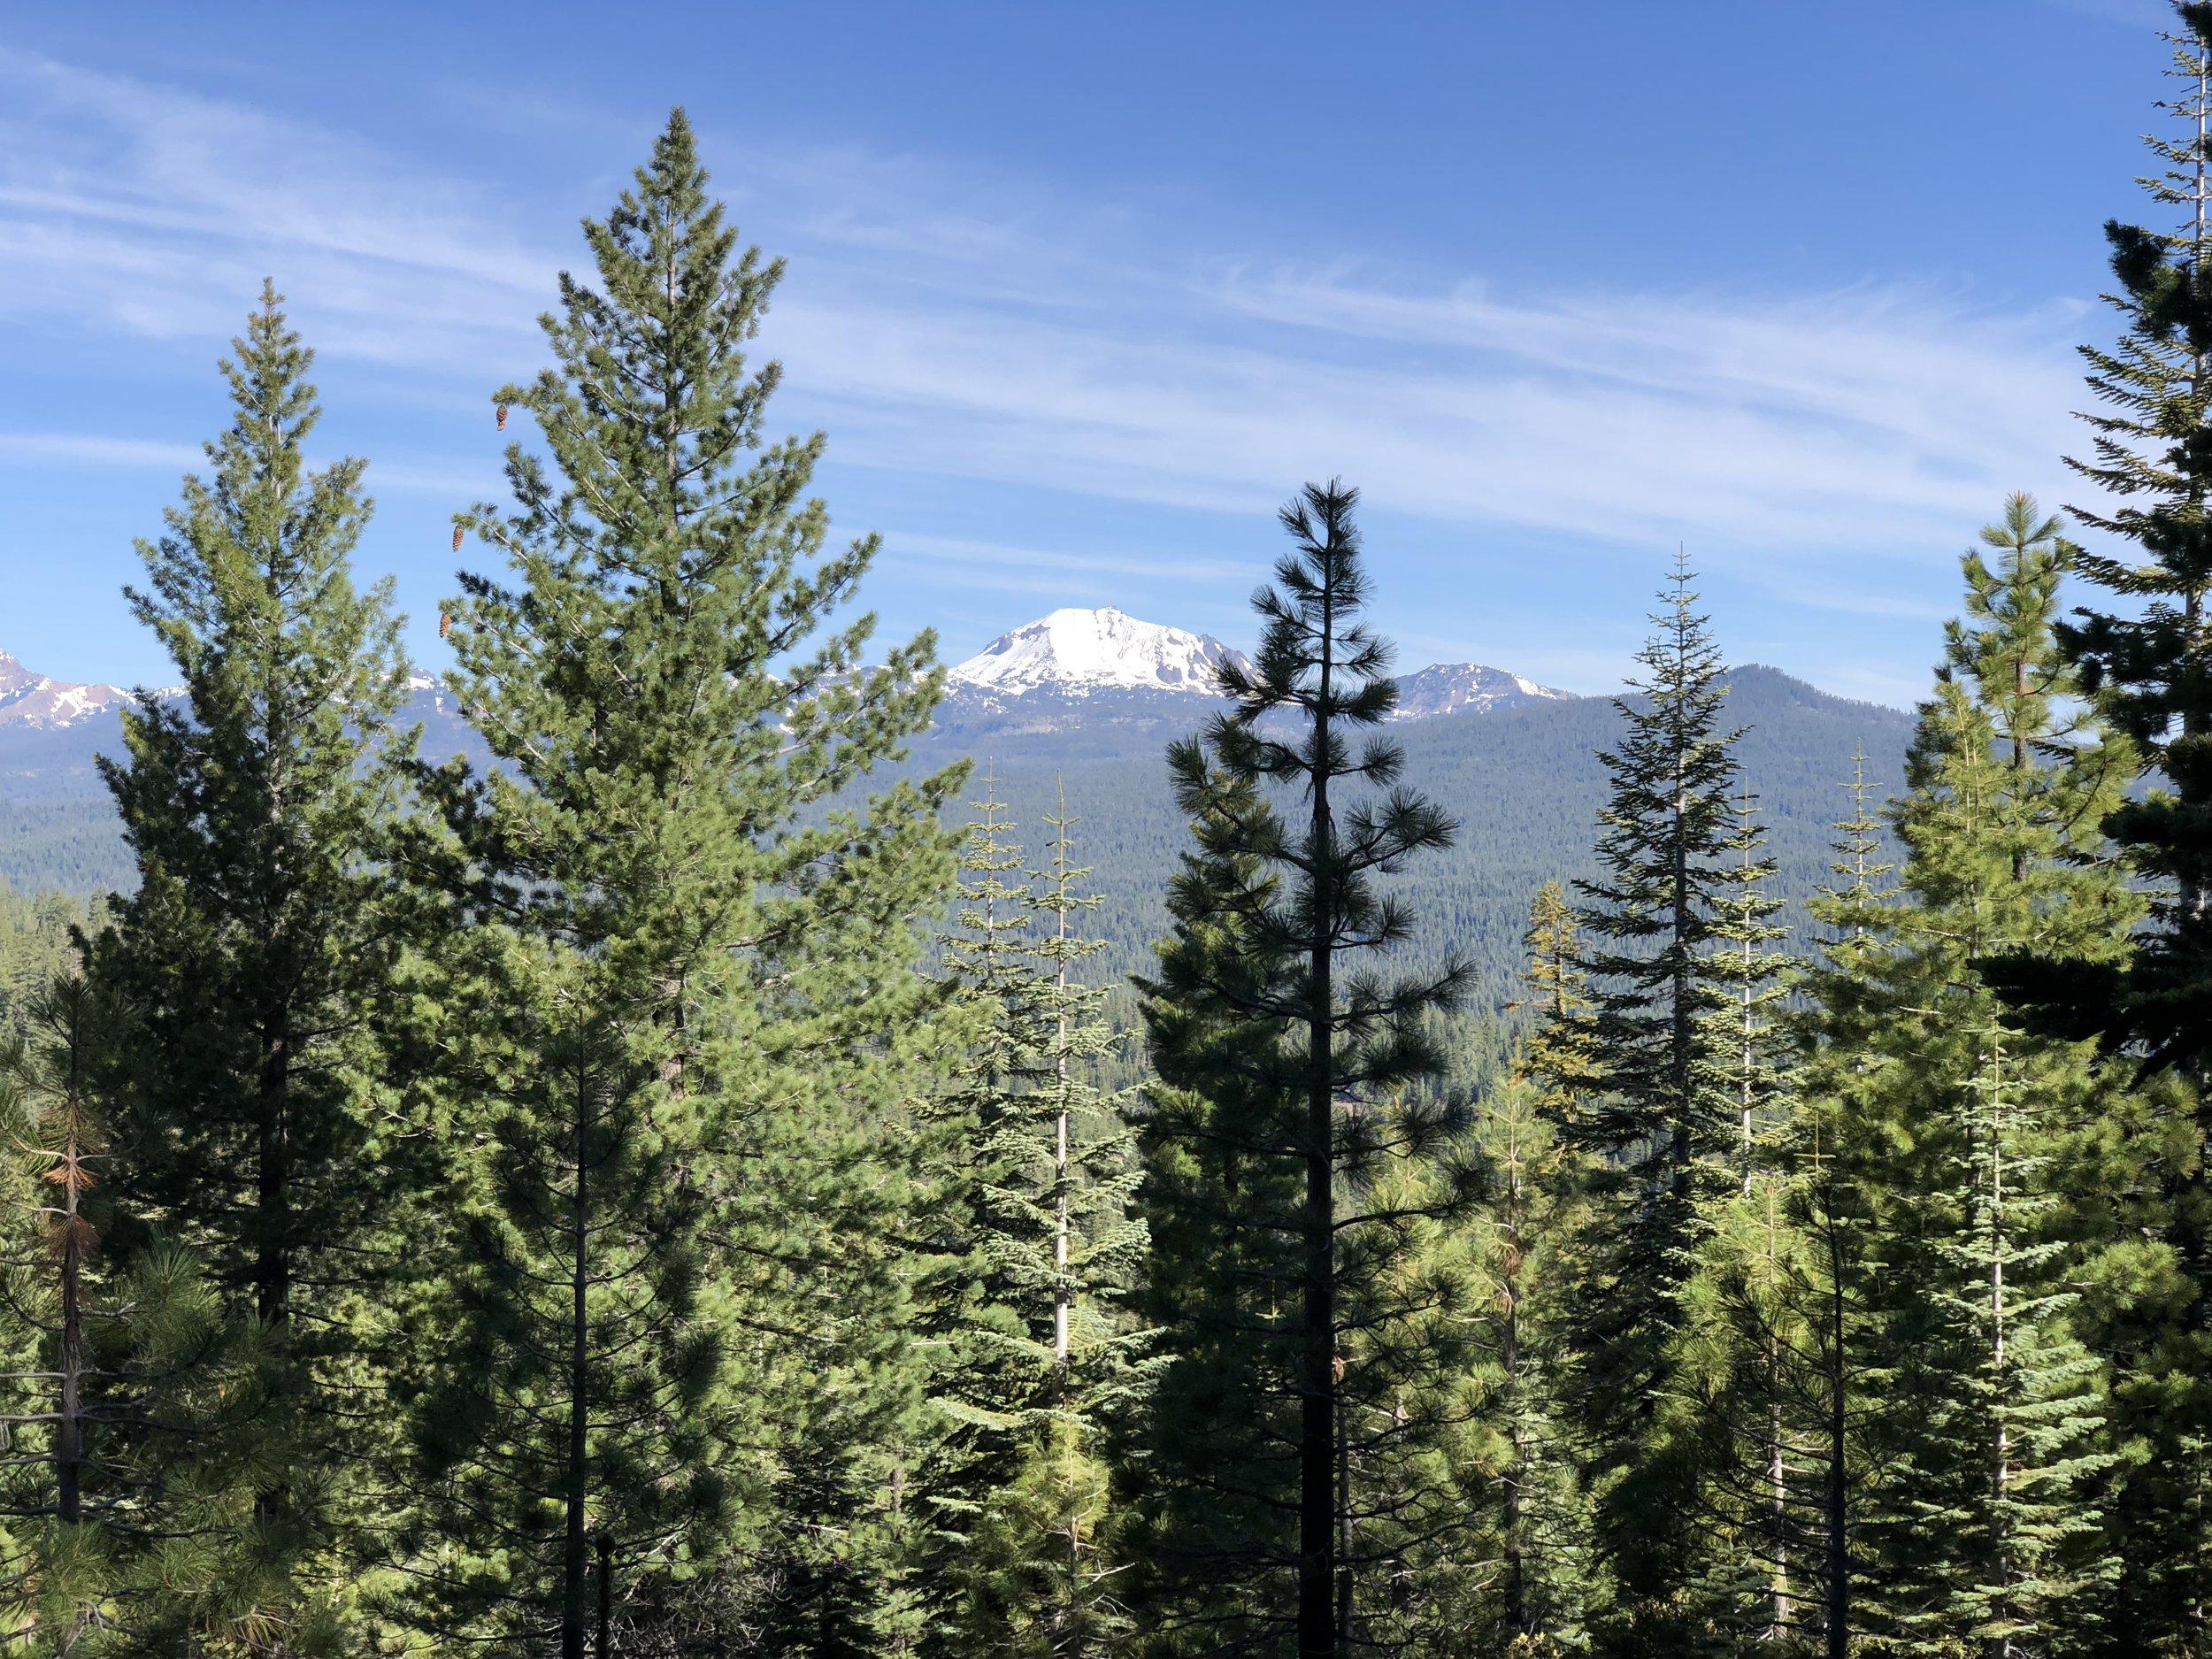 First view of Mount Lassen